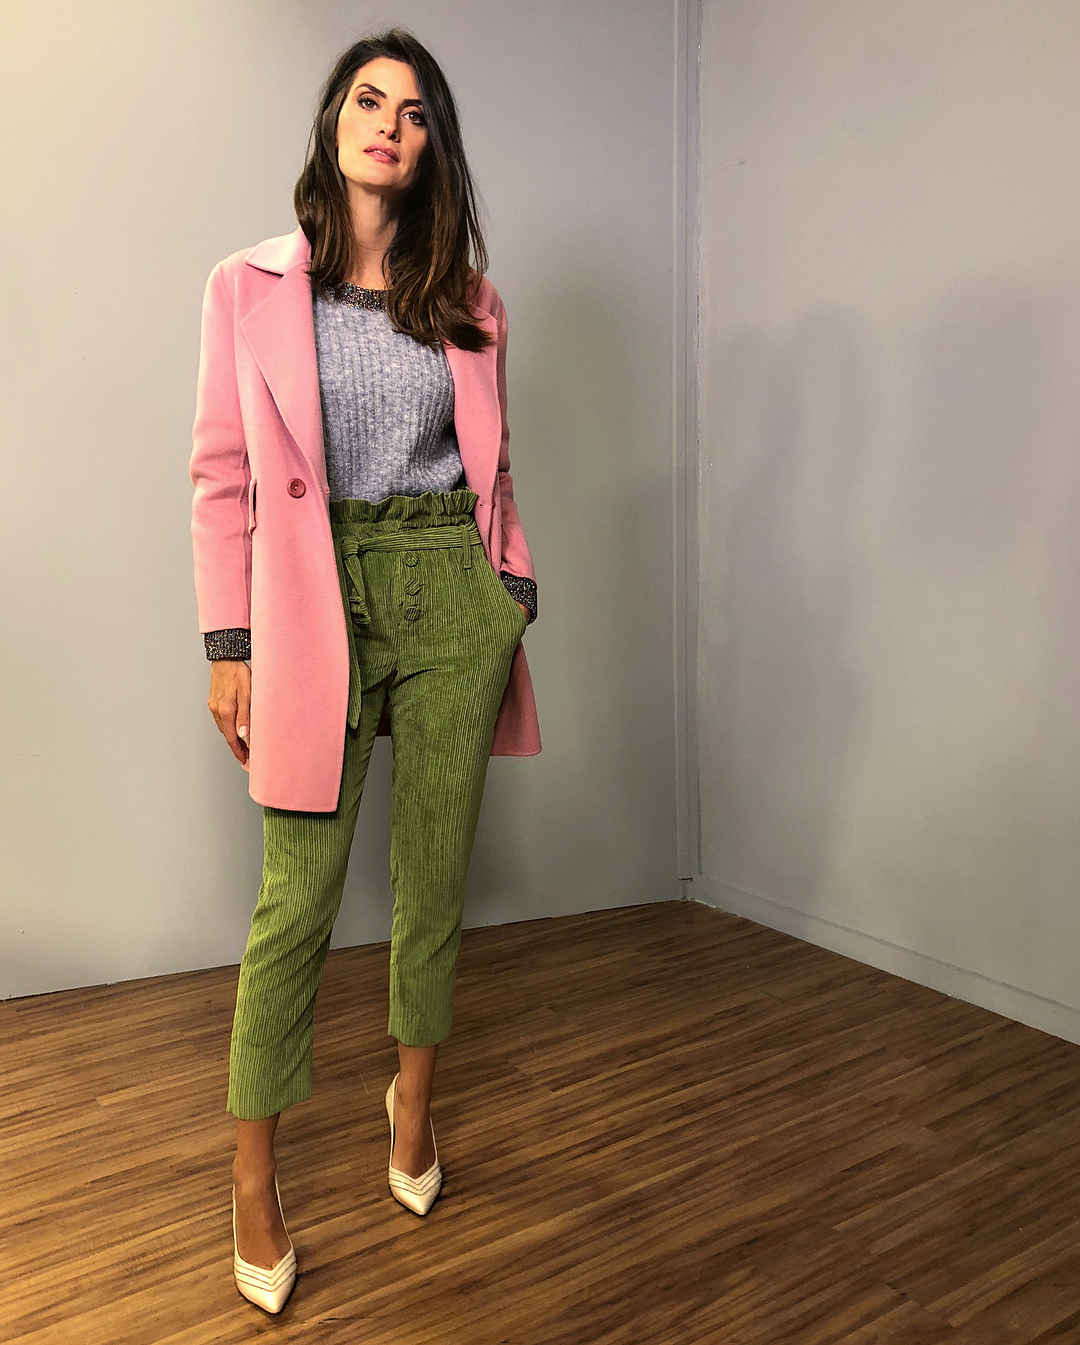 Isabella Fiorentino usa calça verde, blusa cinza e casaco rosa